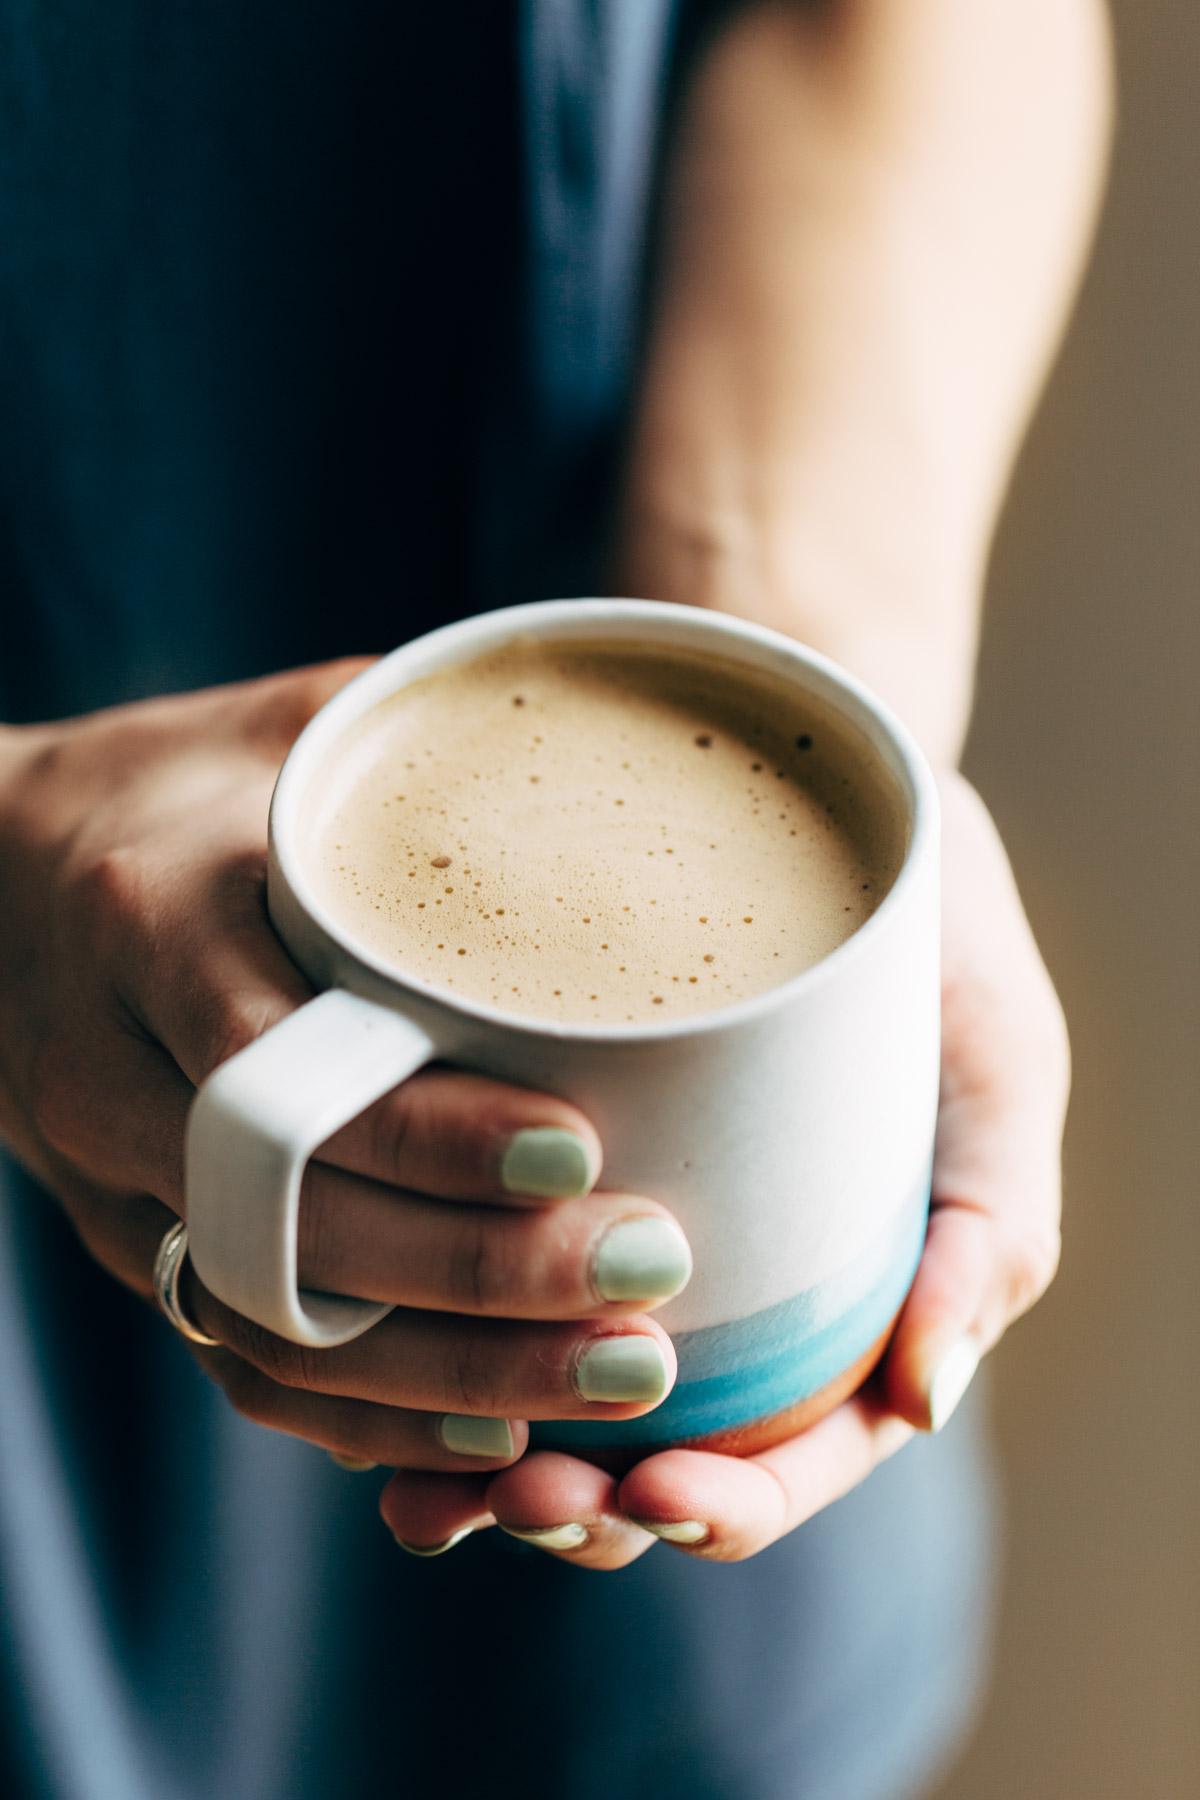 Unbelievably Good Cashew Coffee Recipe - Pinch of Yum